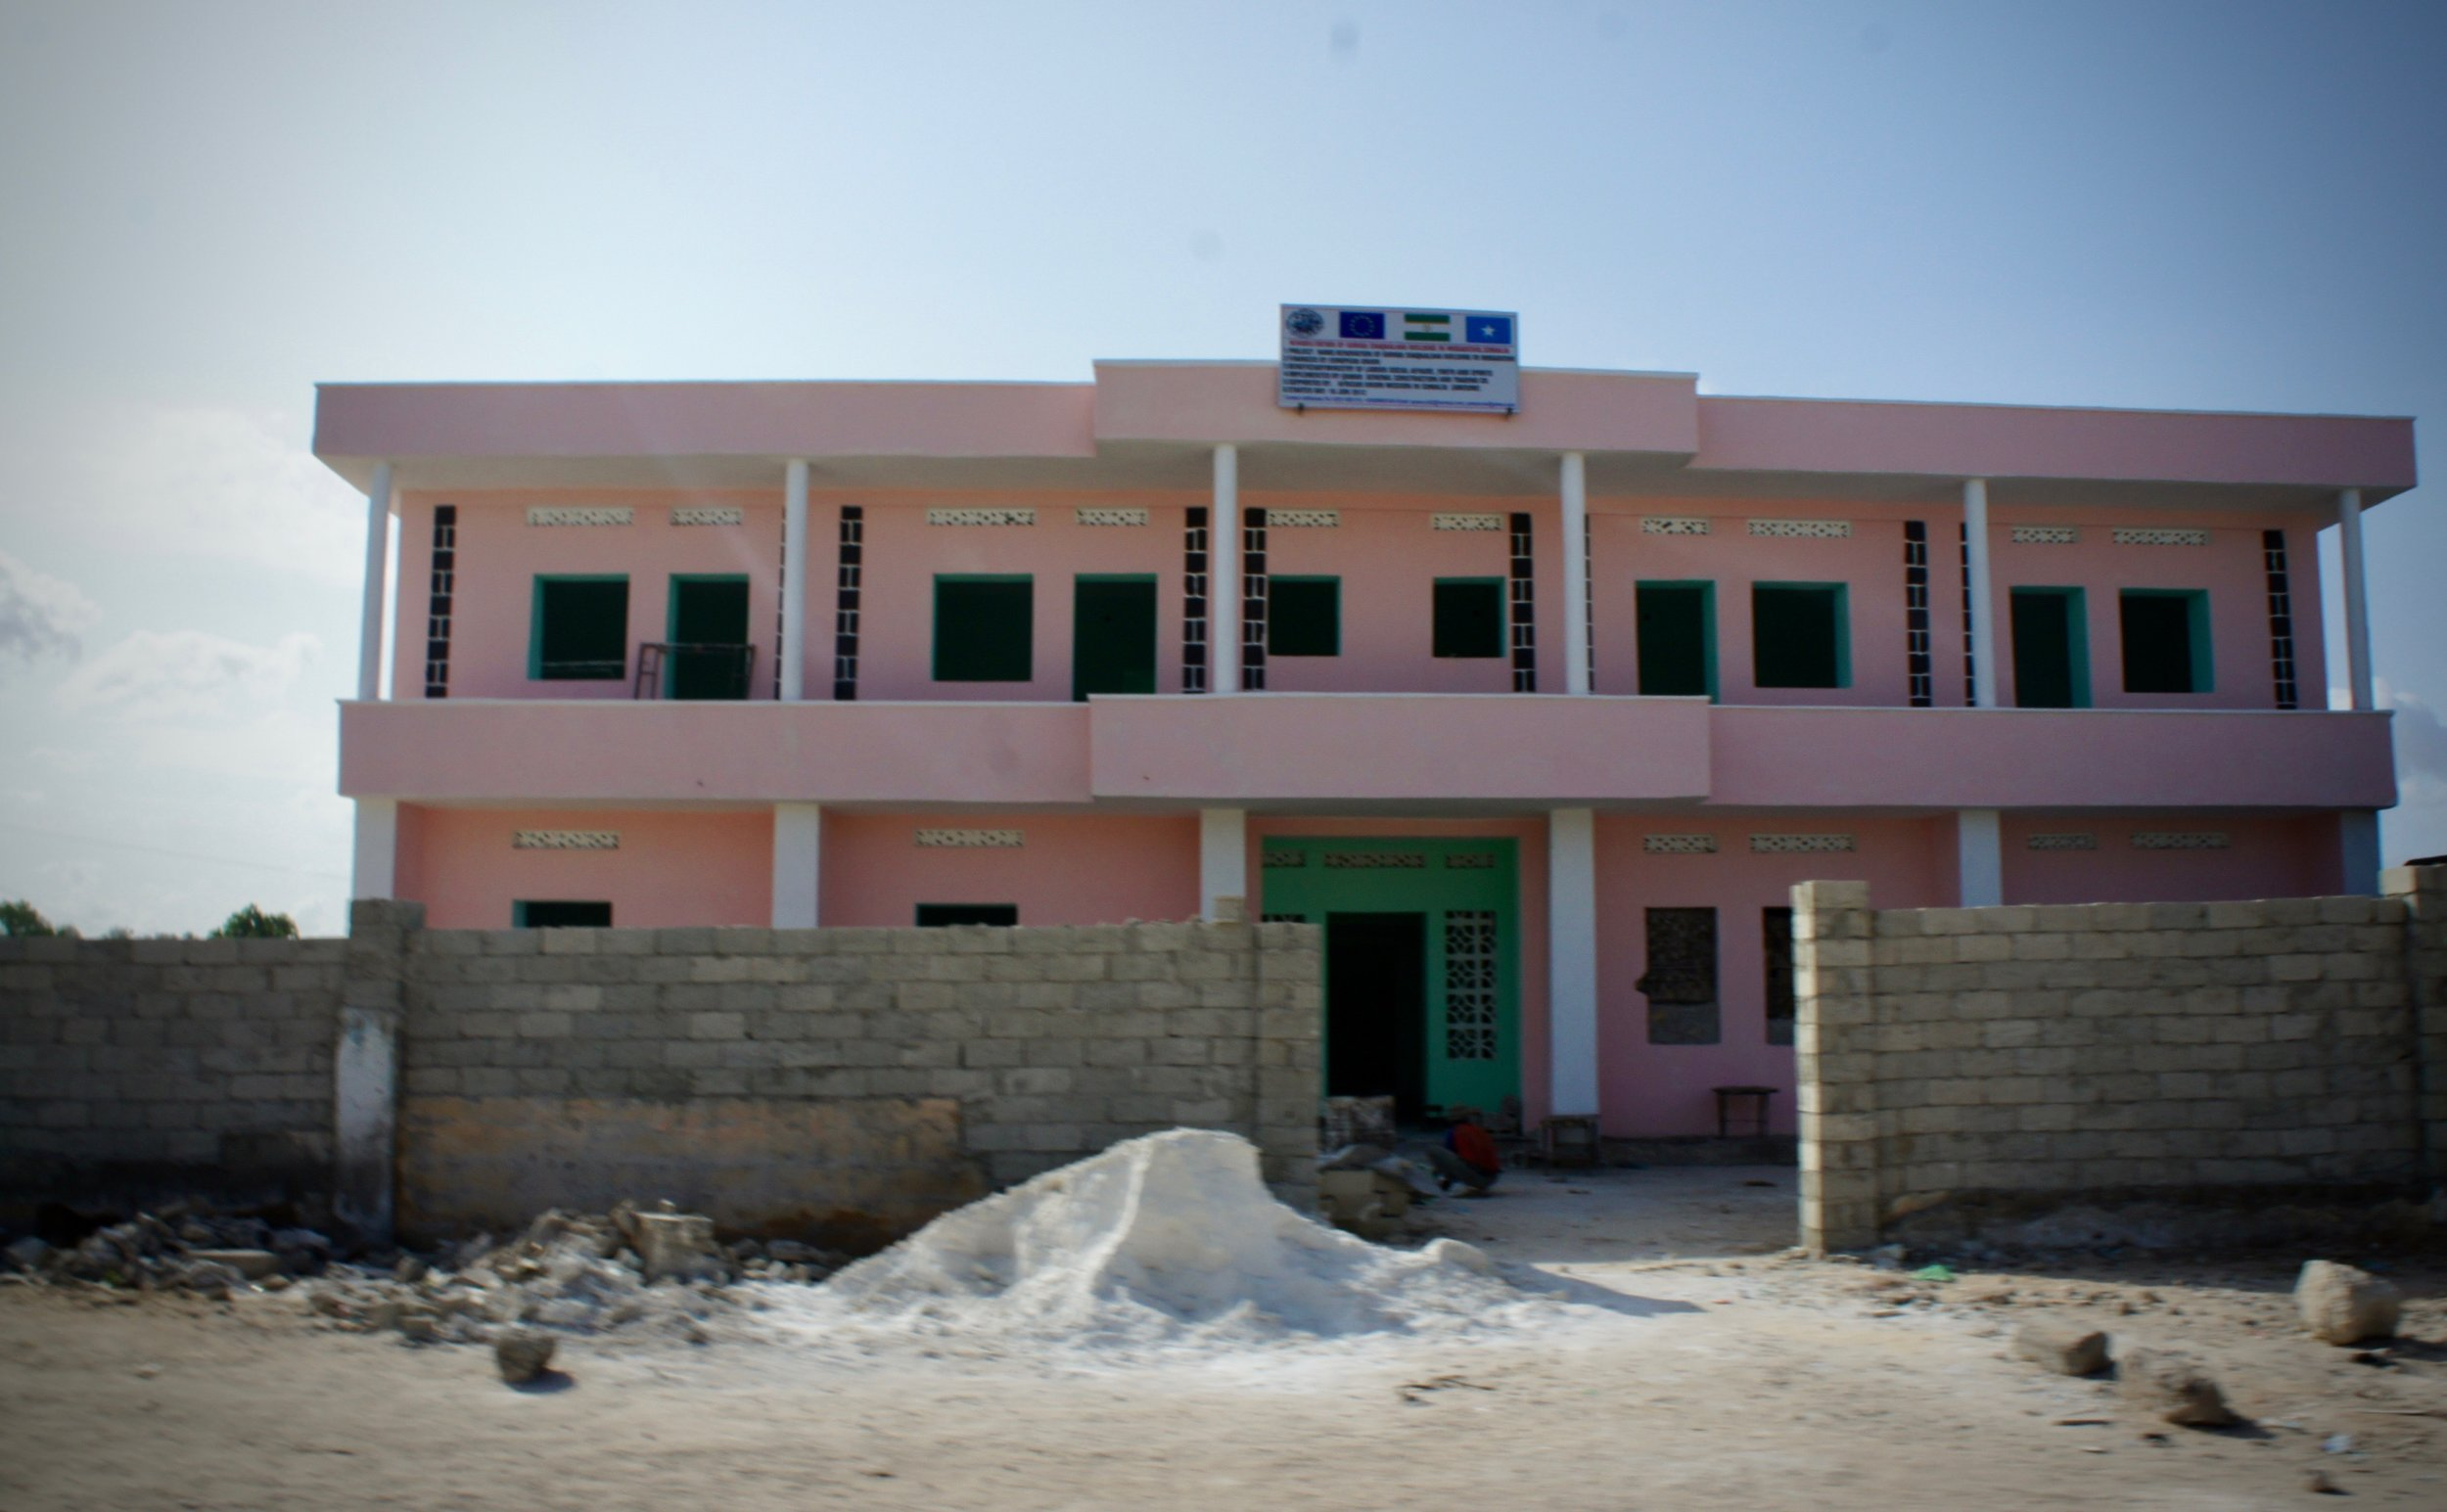 Federal Building, Mogadishu Somalia 2013